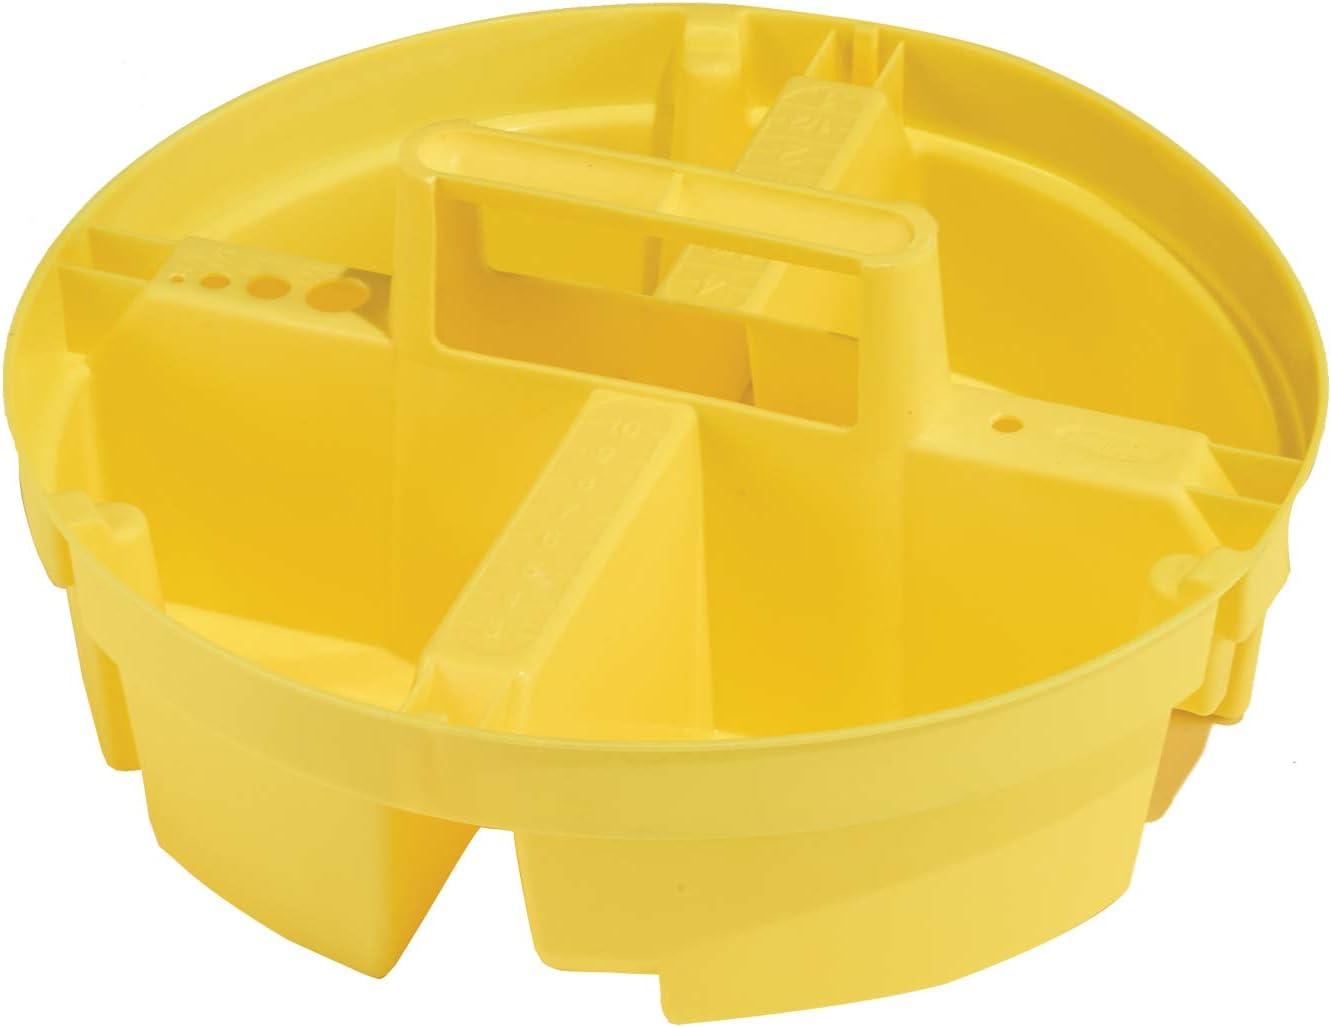 Bucket Boss Bucket Stacker Small Parts Tray in Yellow, 15051